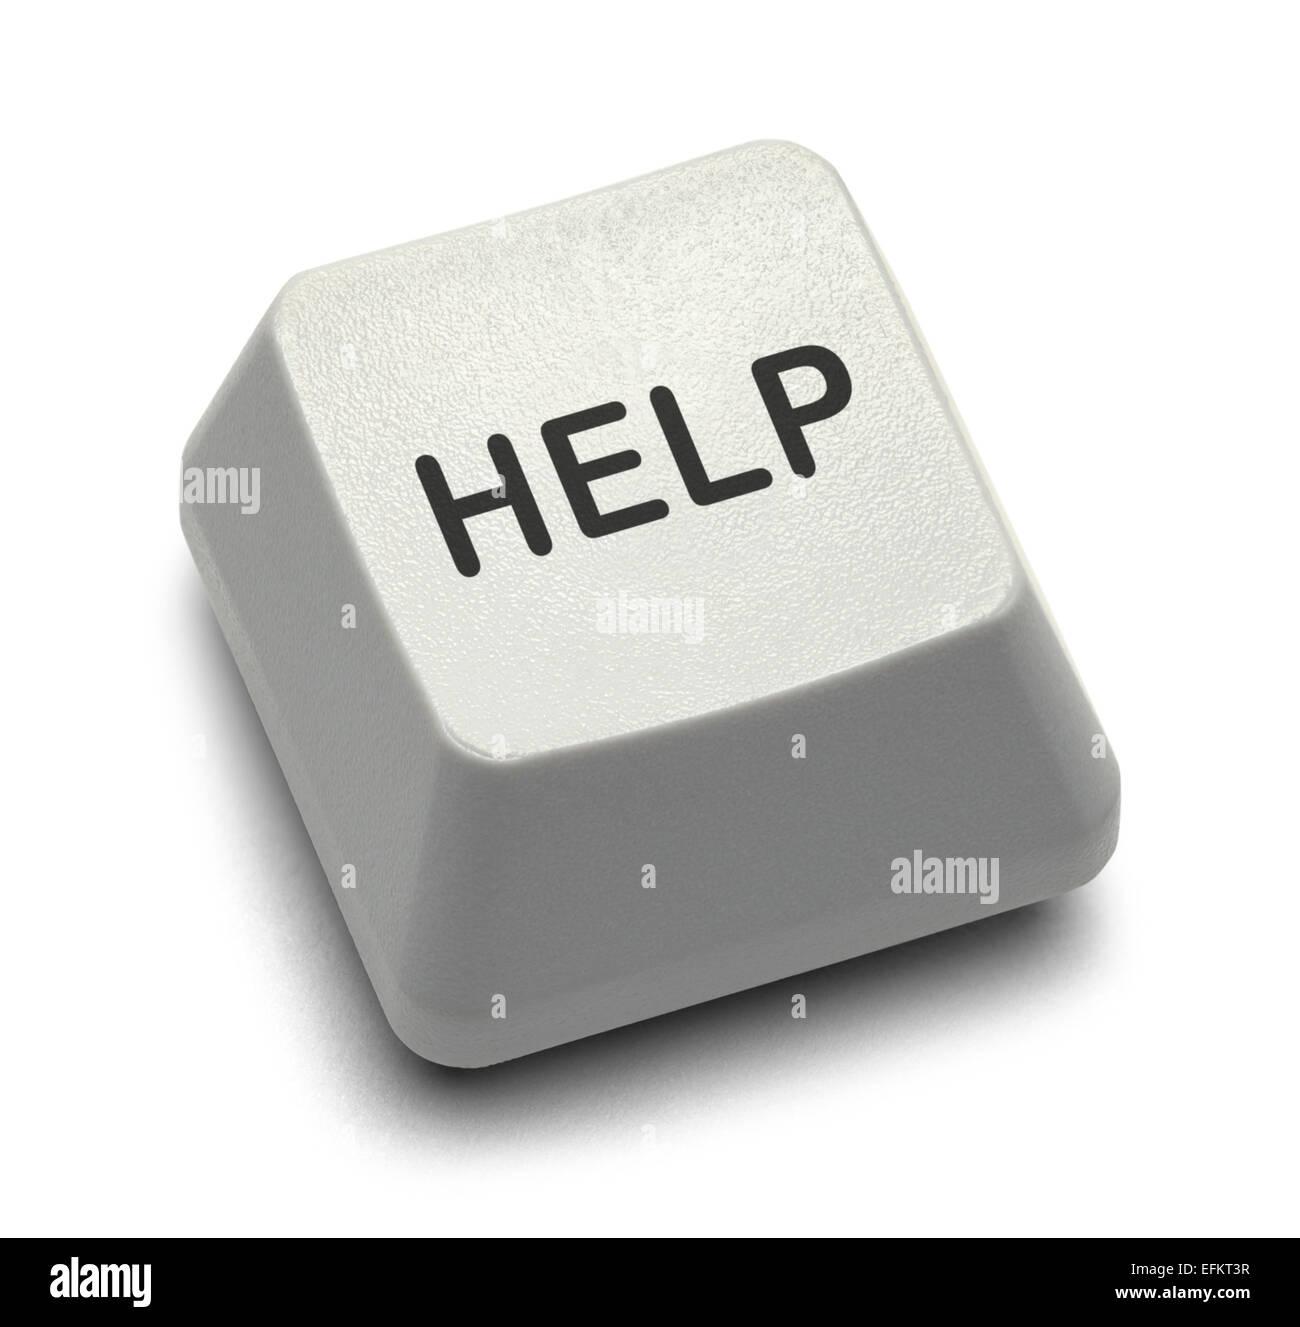 Customer Service Computer Help key Isolated on White Background. - Stock Image